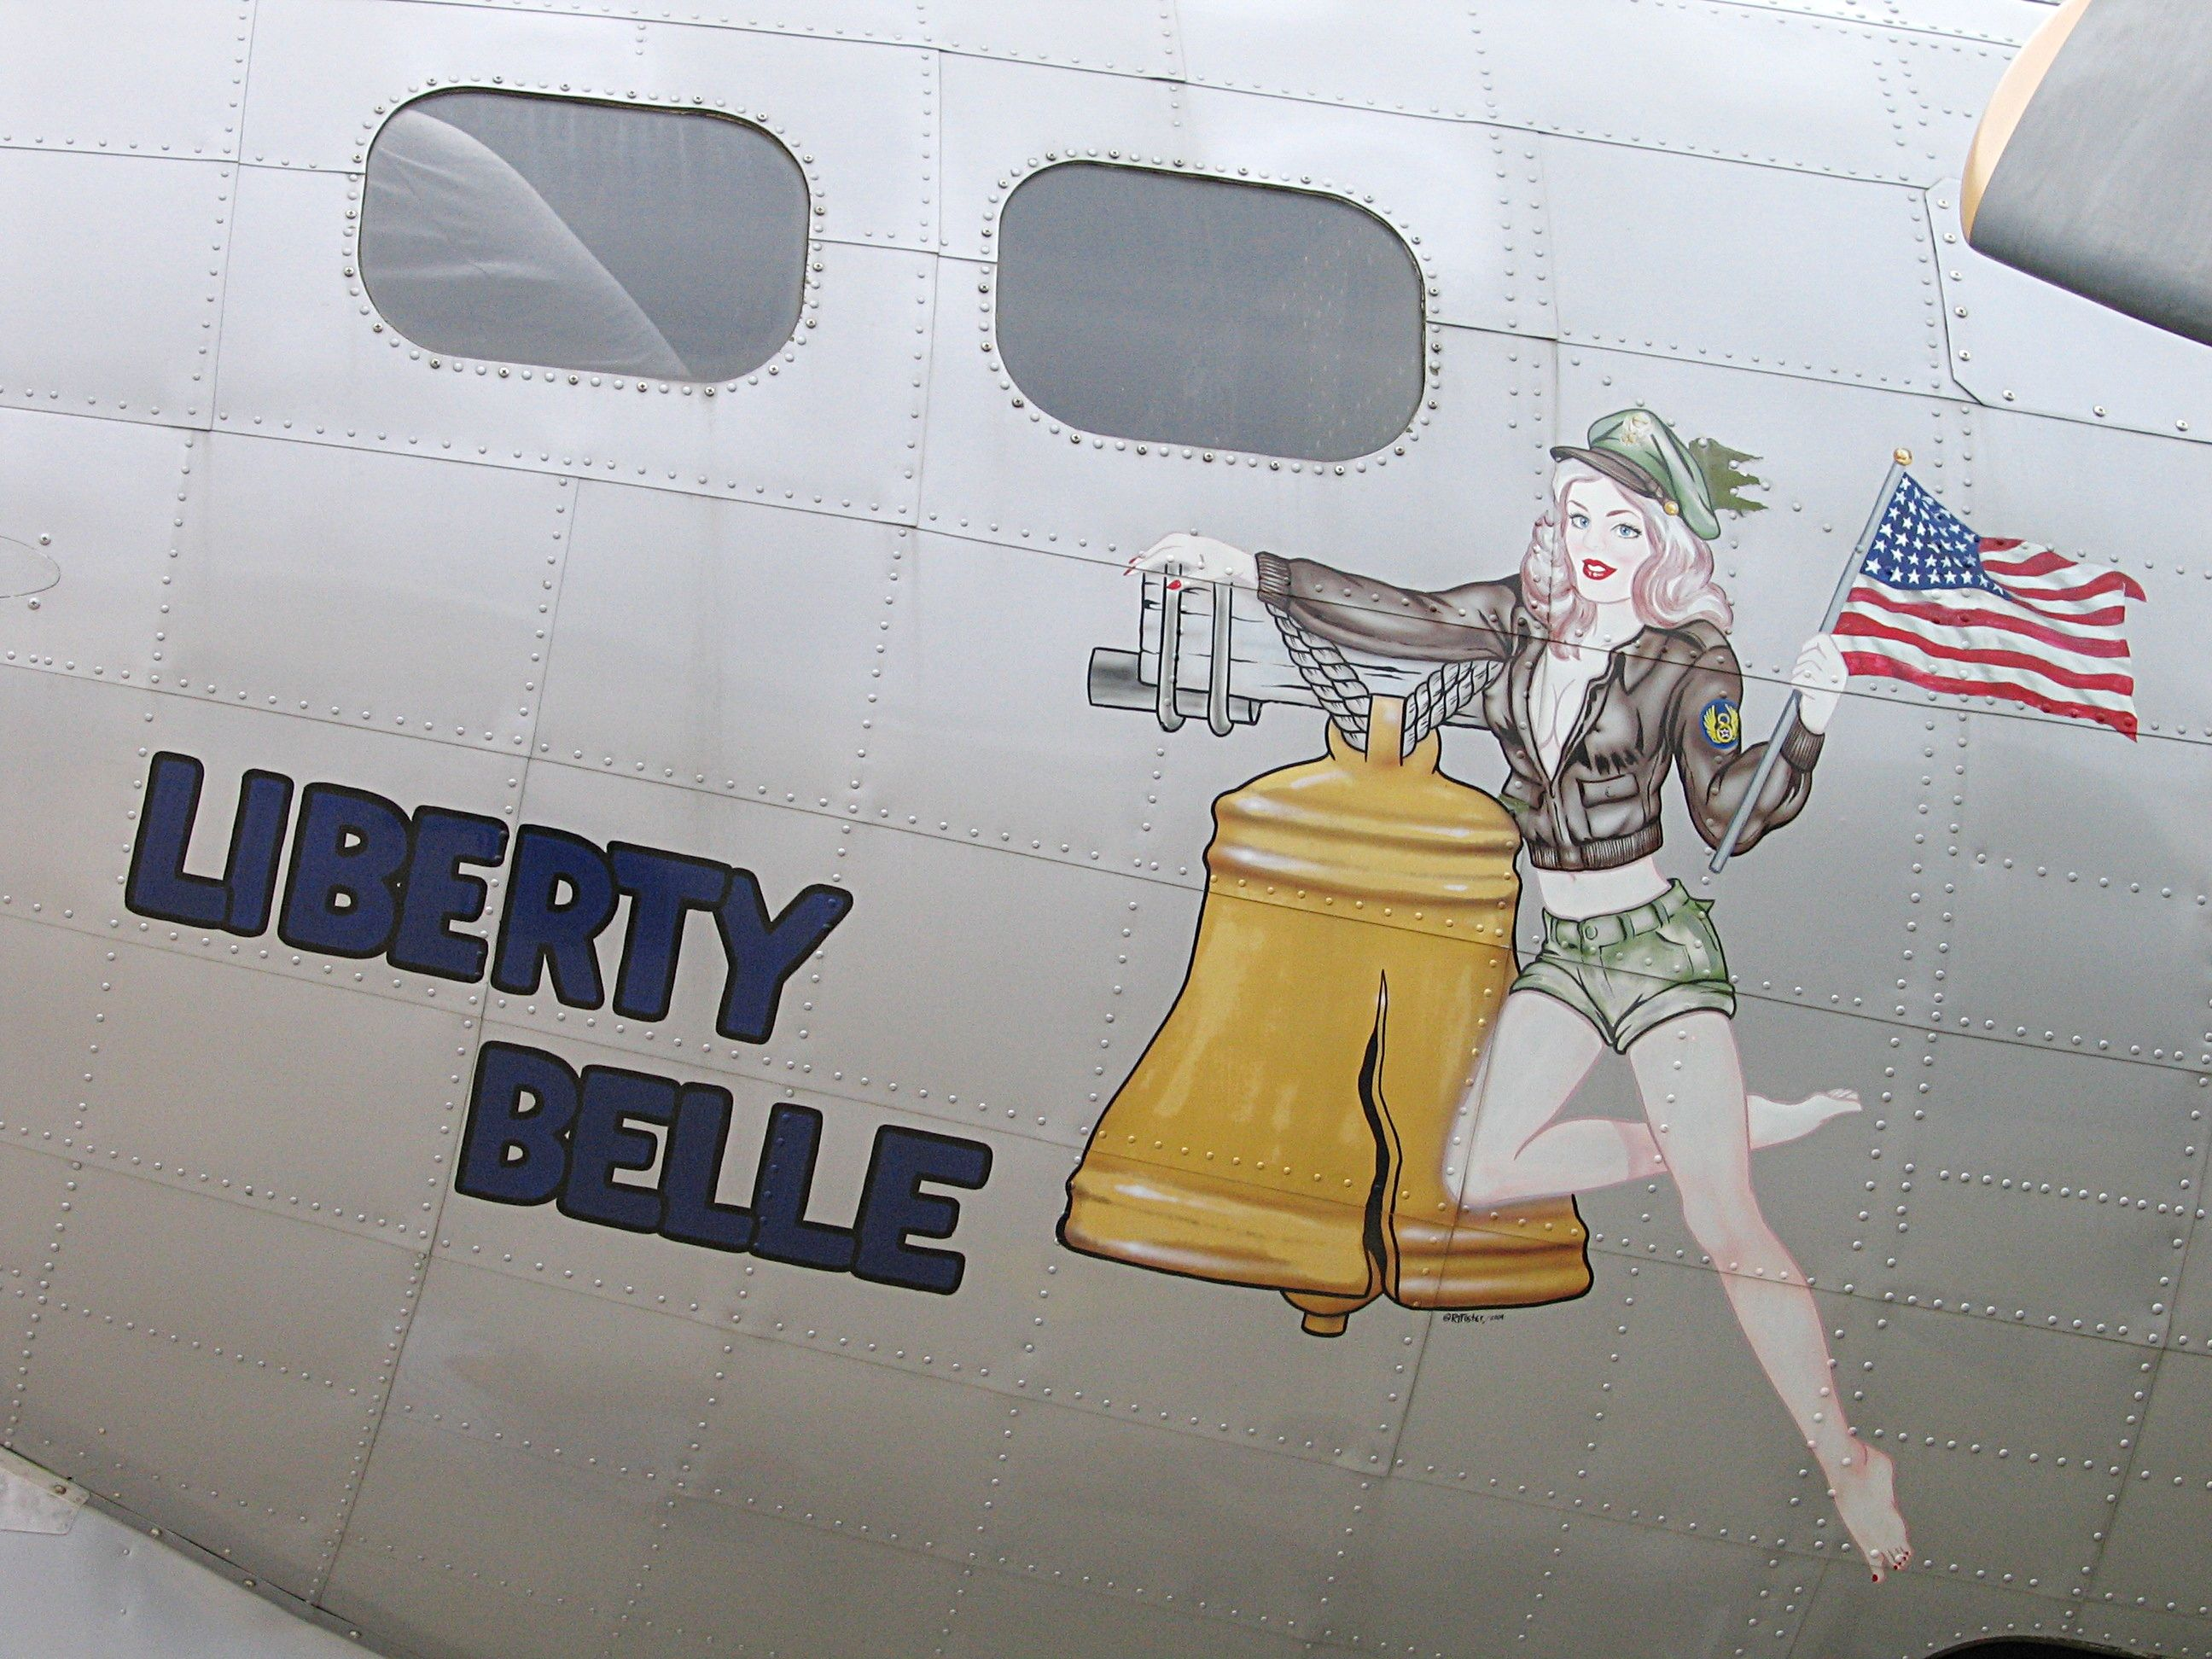 Airplane Nose Art Pin Up Nose Art and PinUp Girls